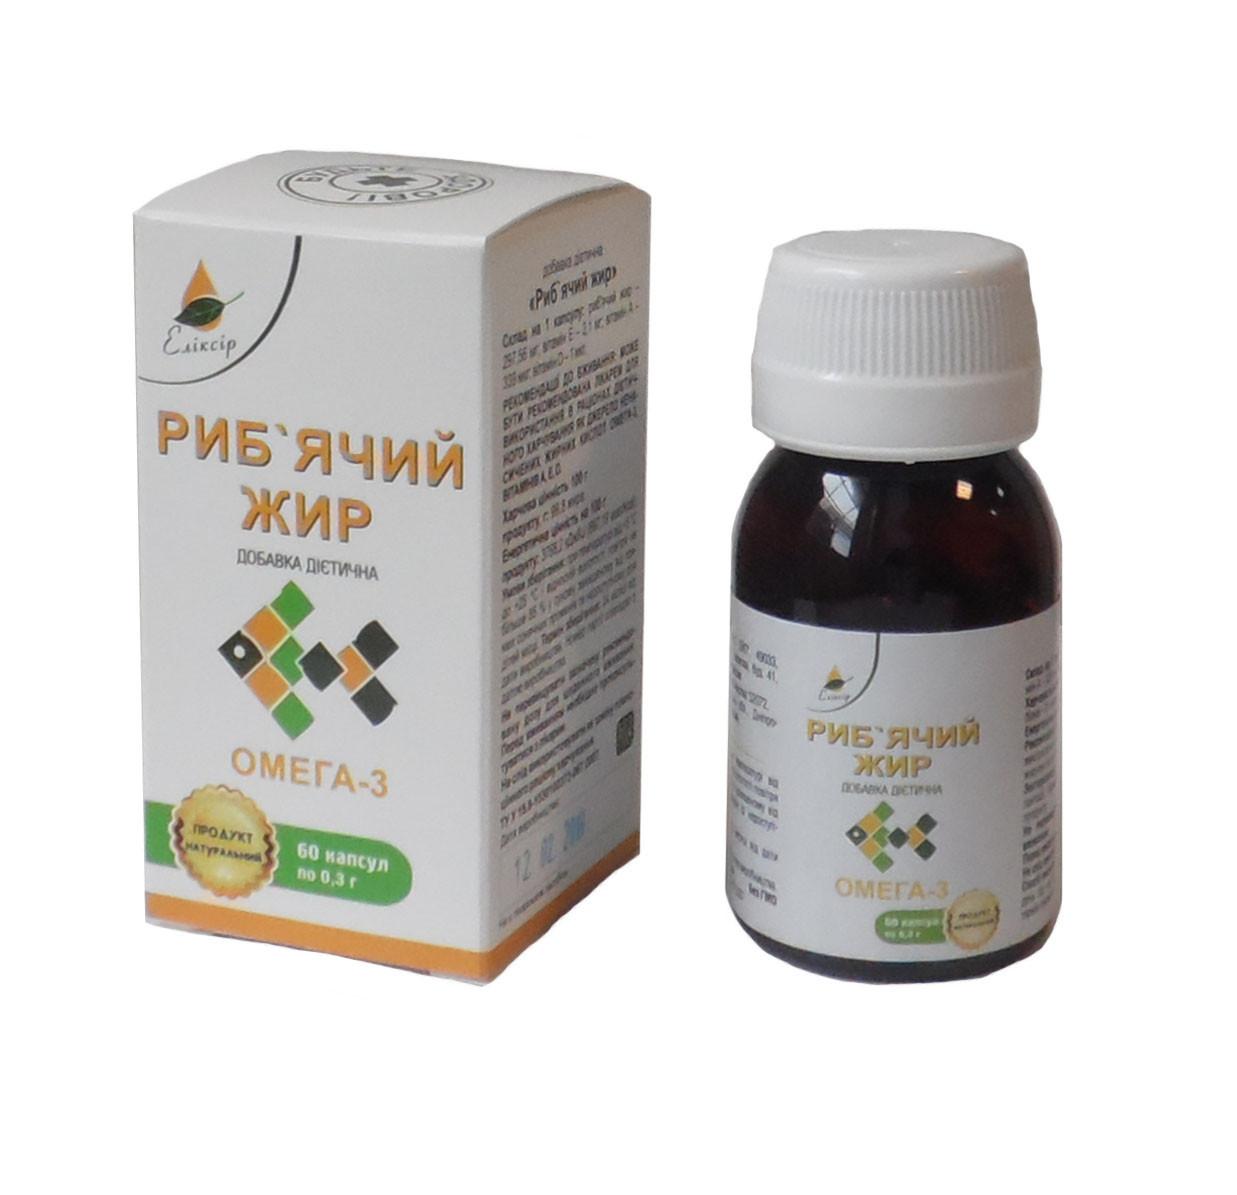 Рыбий жир Омега-3 60 капсул Эликсир